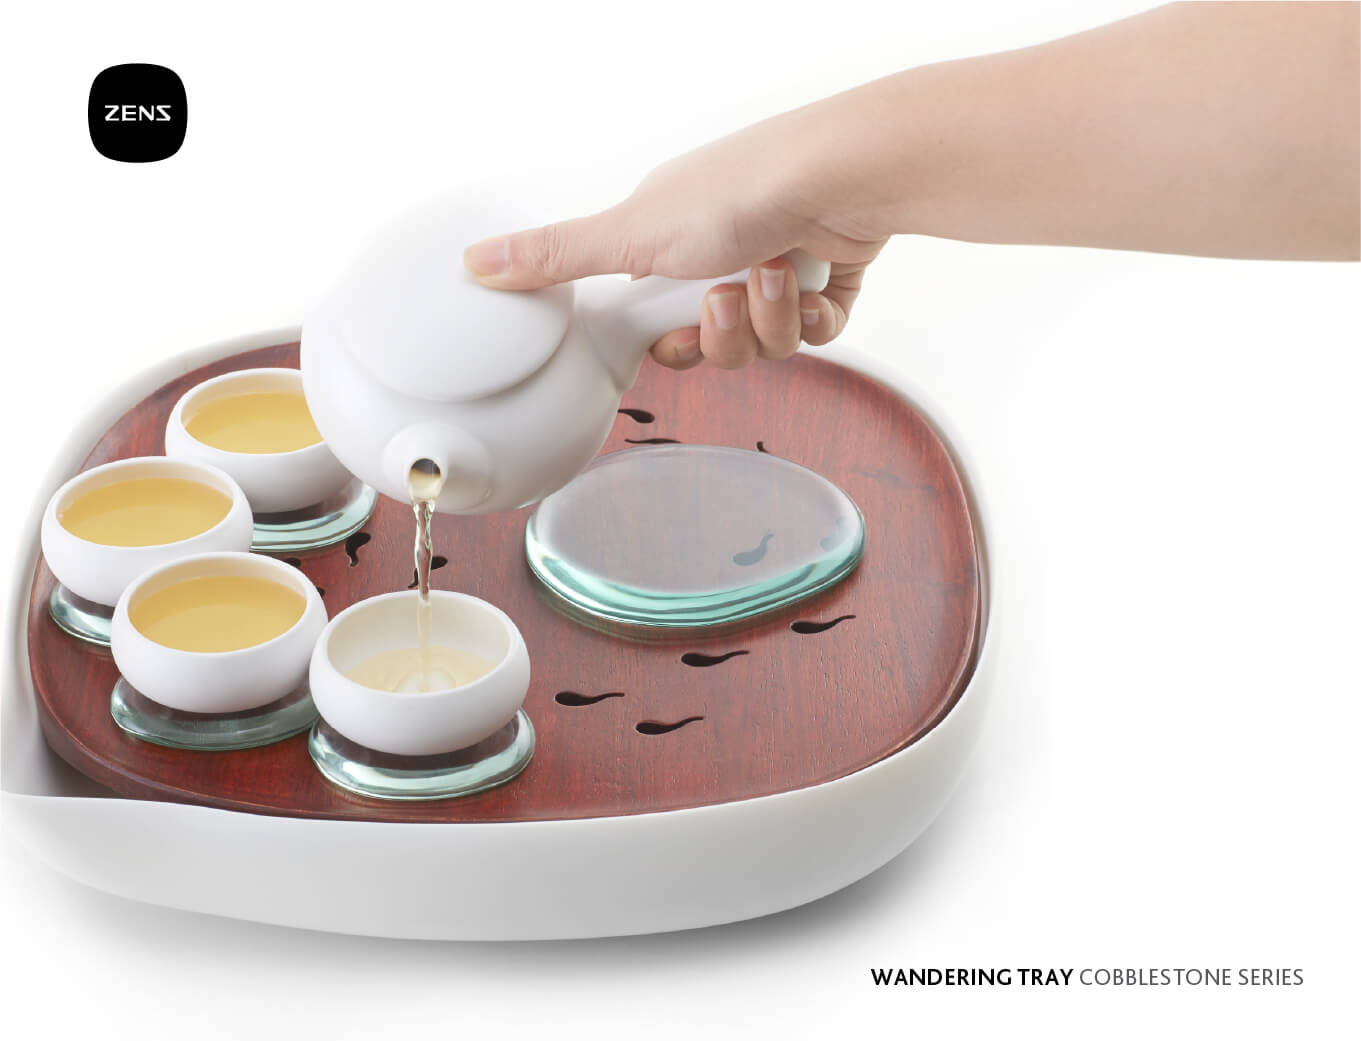 zens tableware branded tea set designed by orange branding